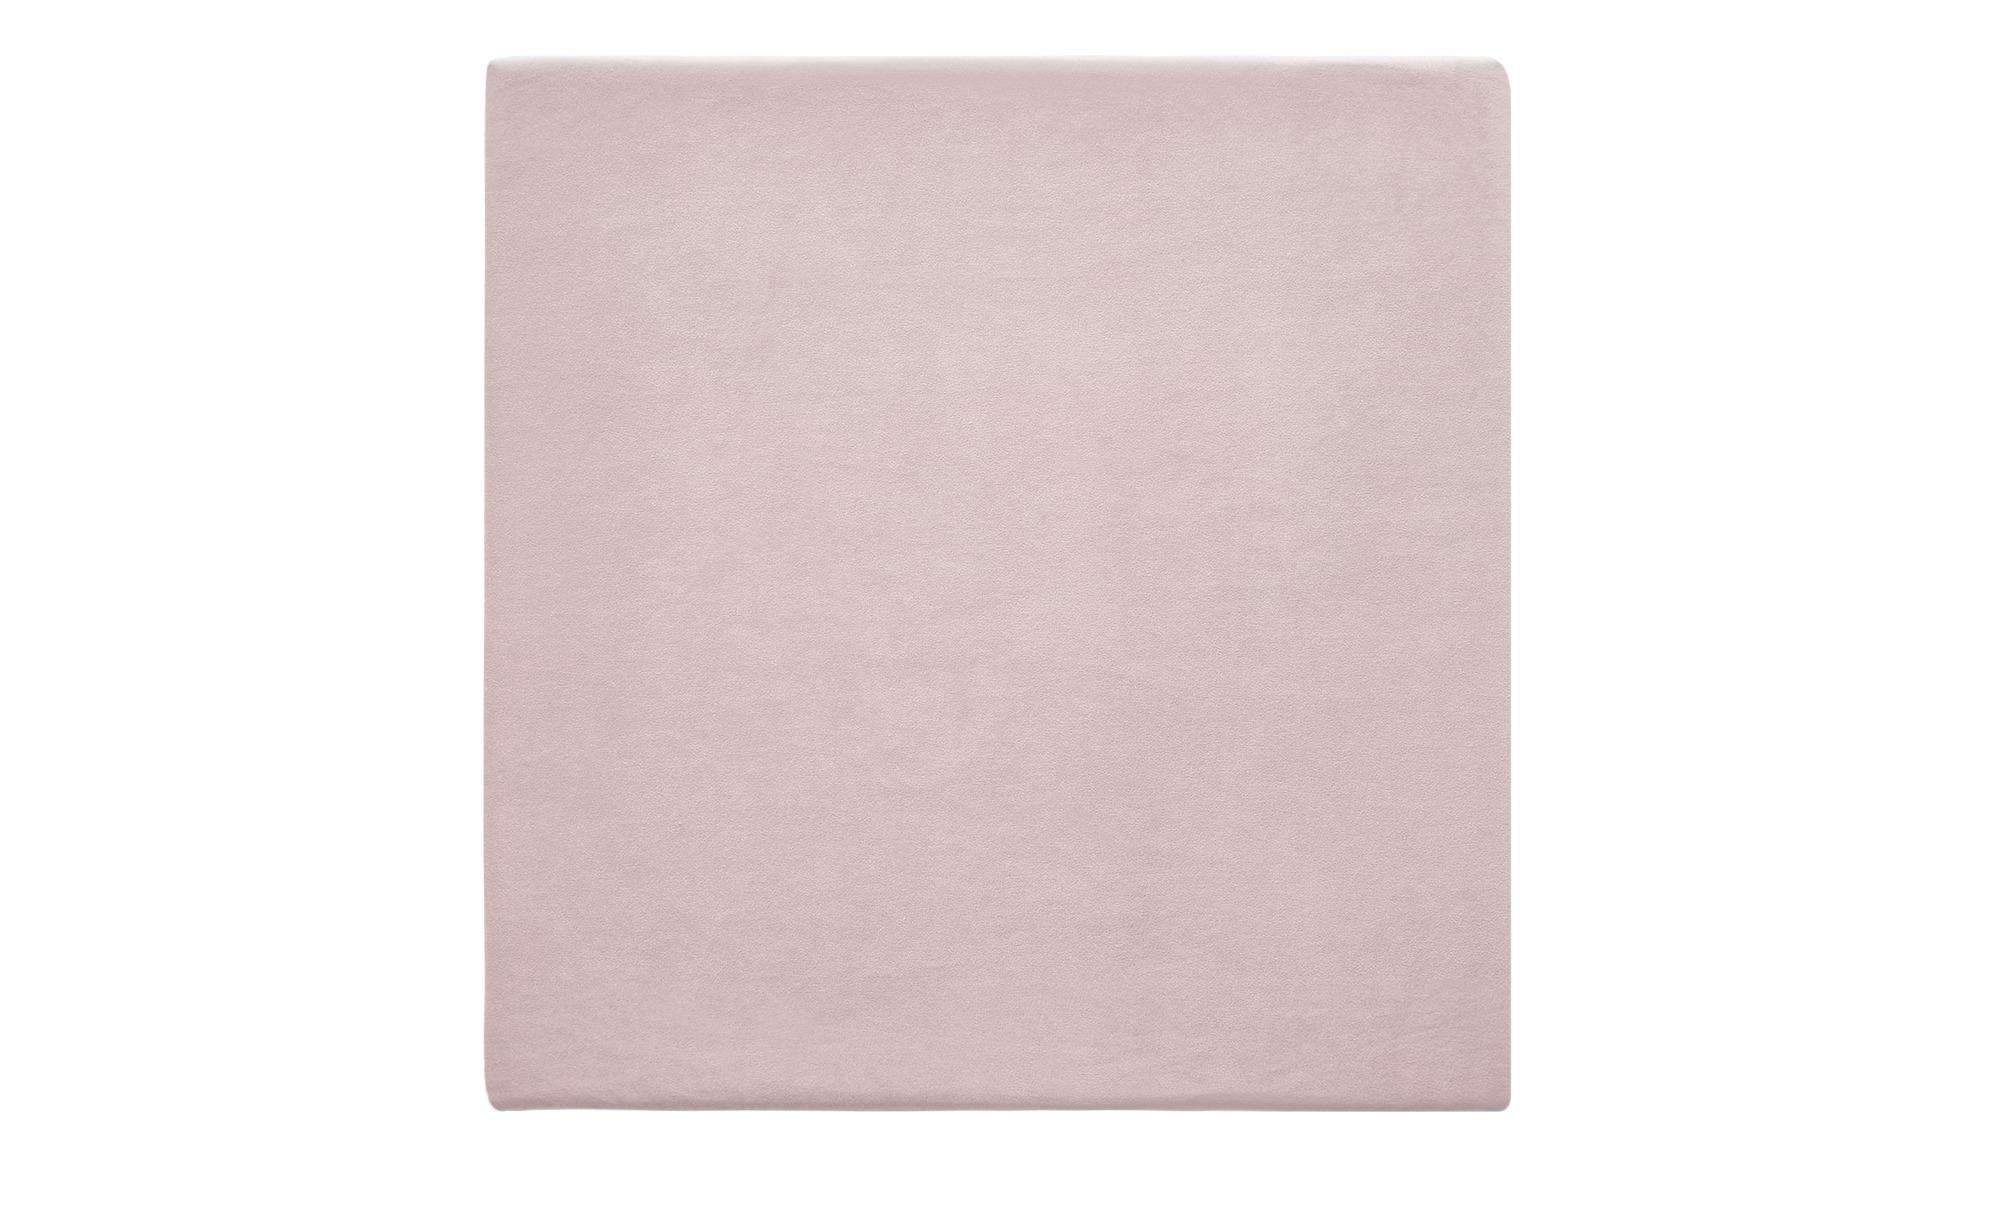 Sitzkissen  Suri ¦ rosa/pink ¦ Maße (cm): B: 55 H: 12 T: 55 Polstermöbel > Hocker > Sitzsäcke - Höffner